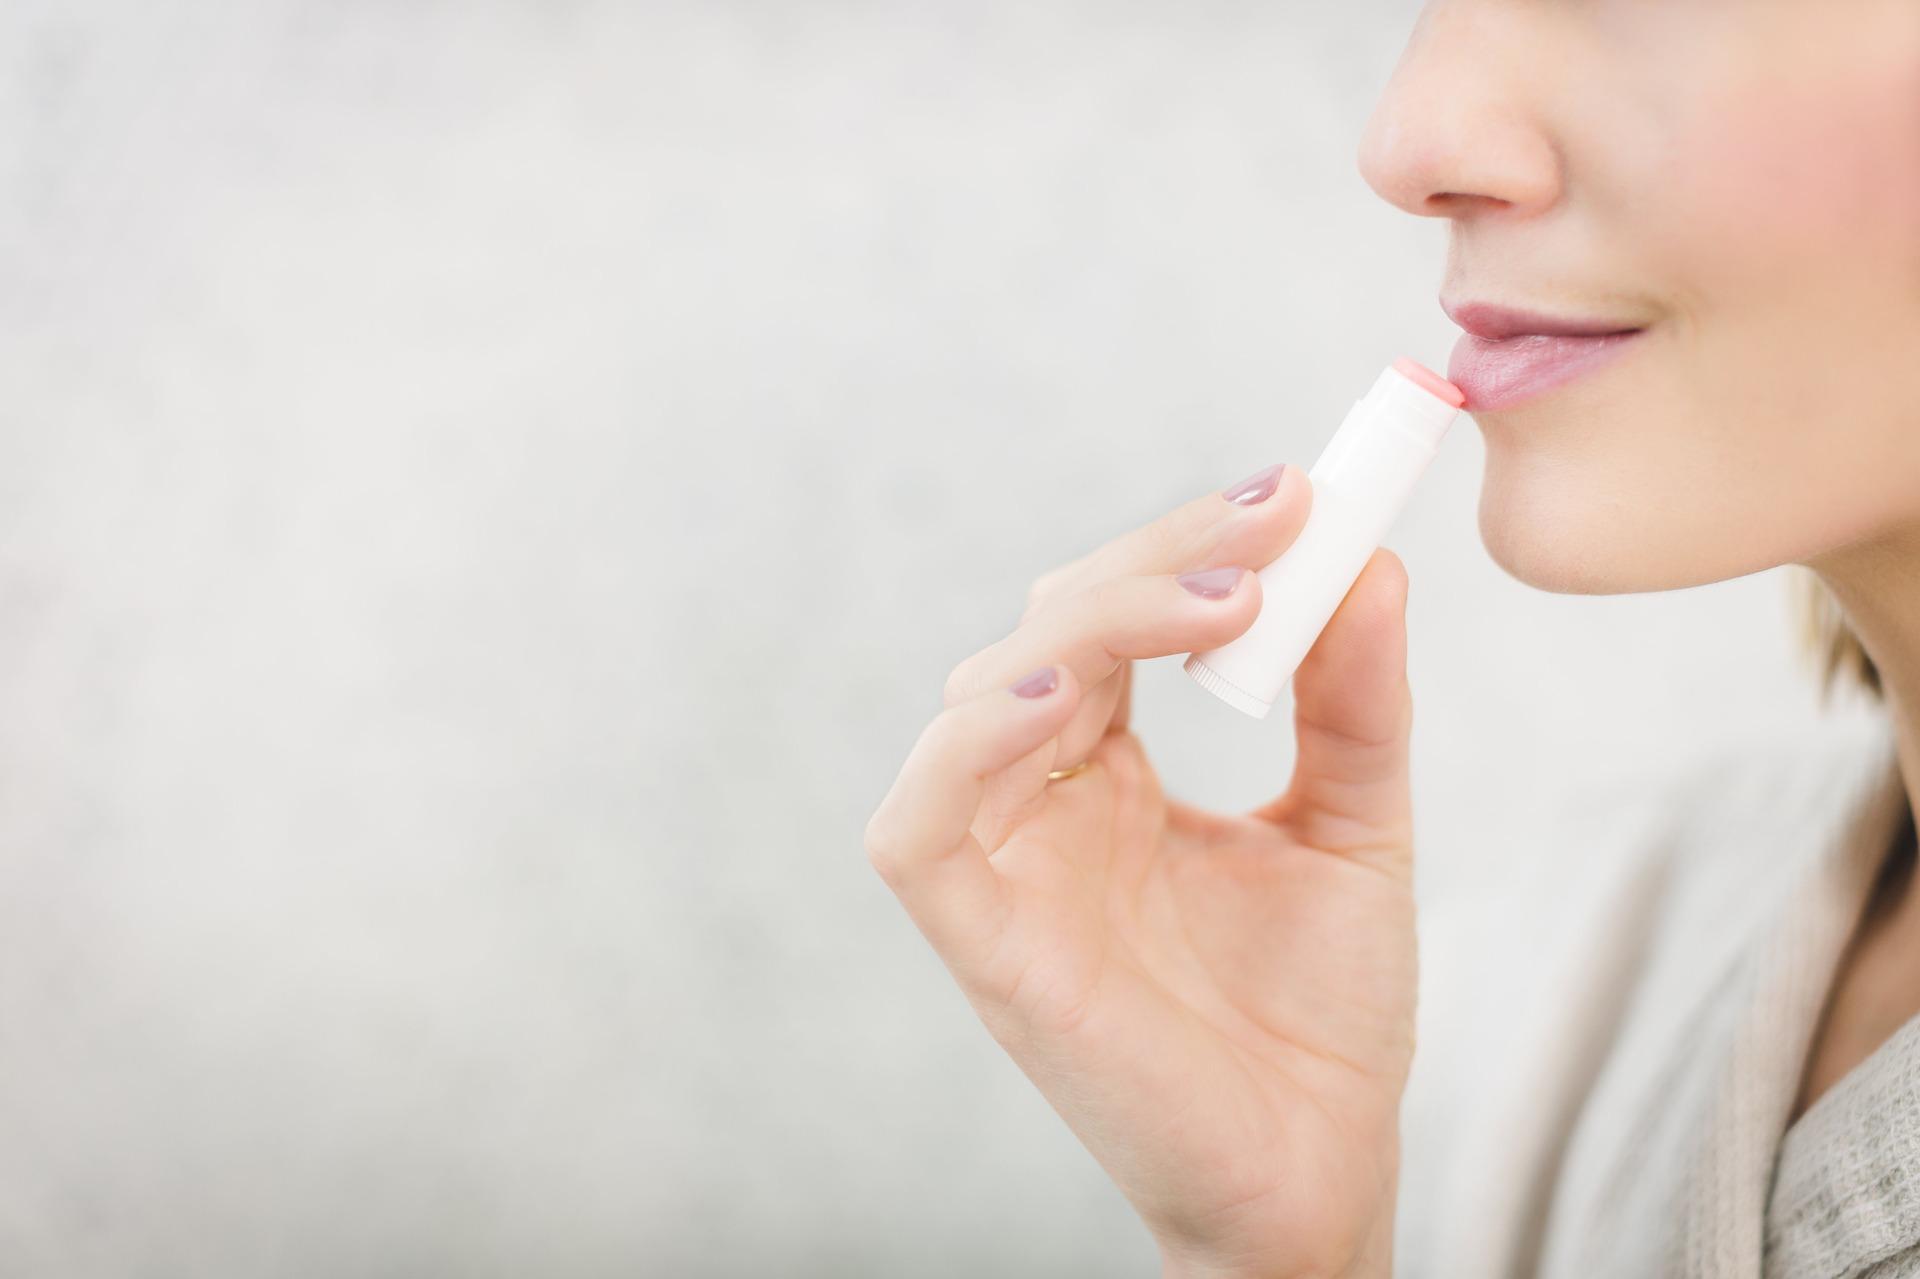 Photo of Glänzende Oil Lips statt klebriger Lipgloss: Lippenöl braucht aktuell jede Frau